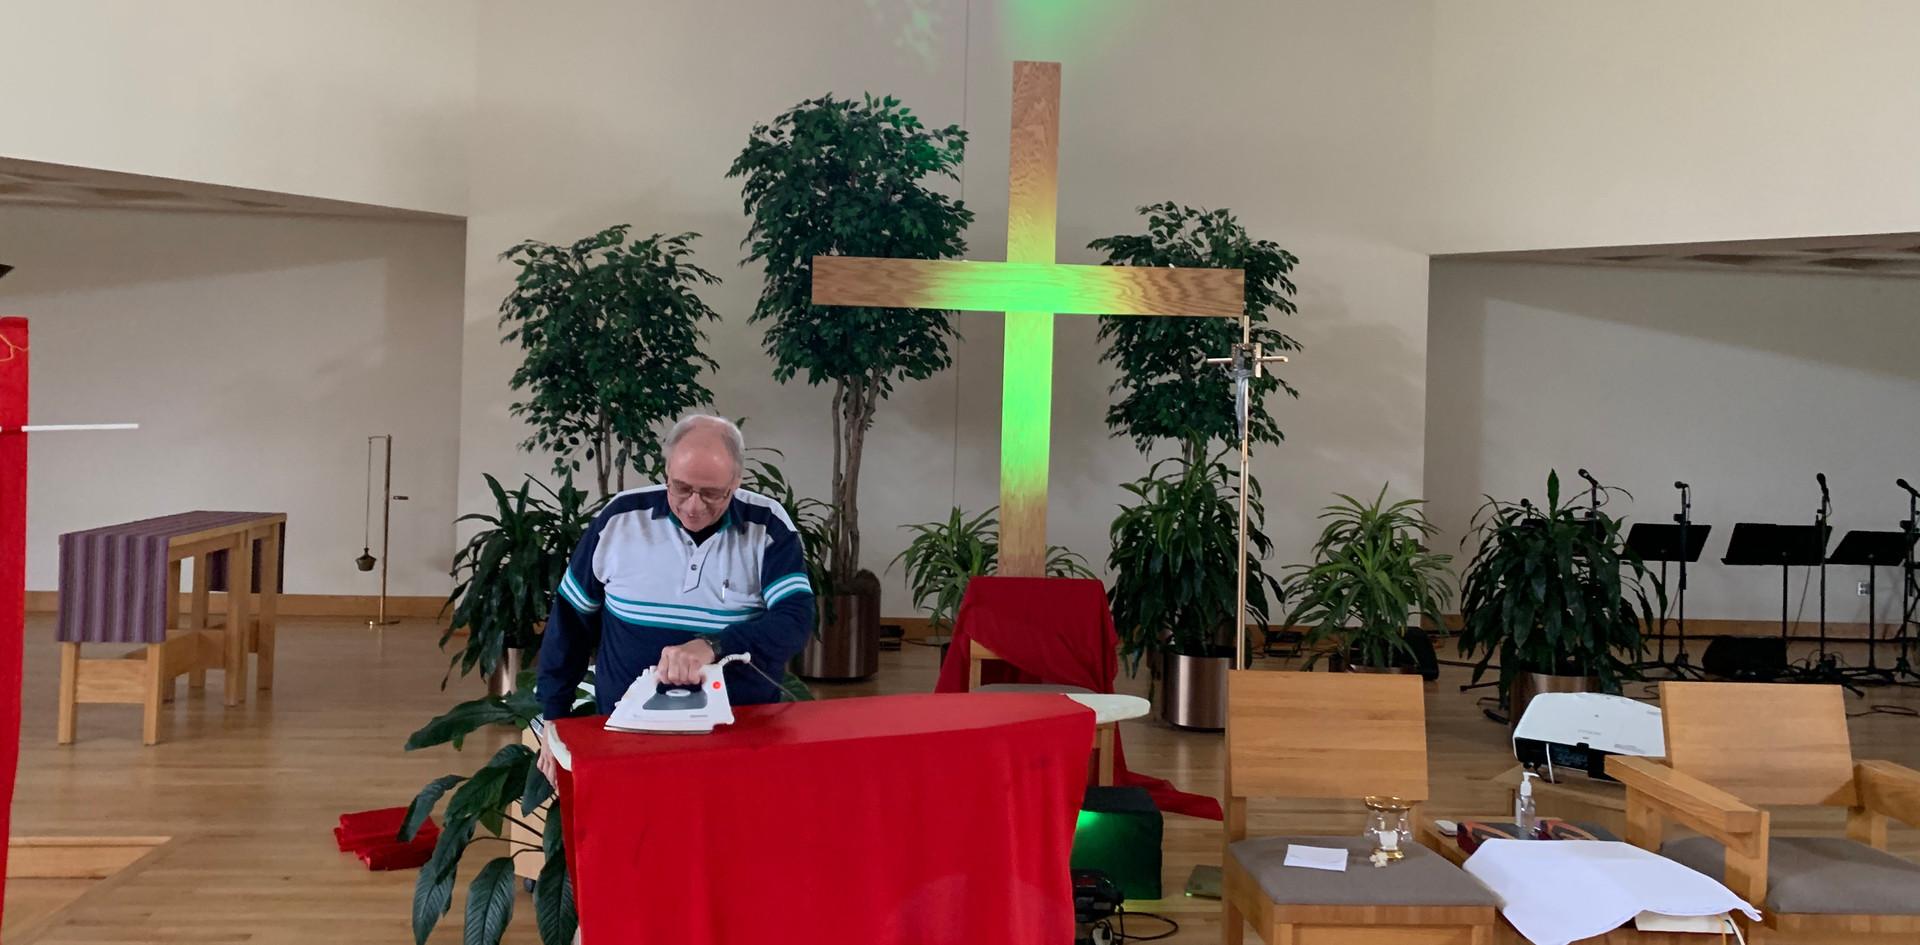 Fr. Joe ironing ;)